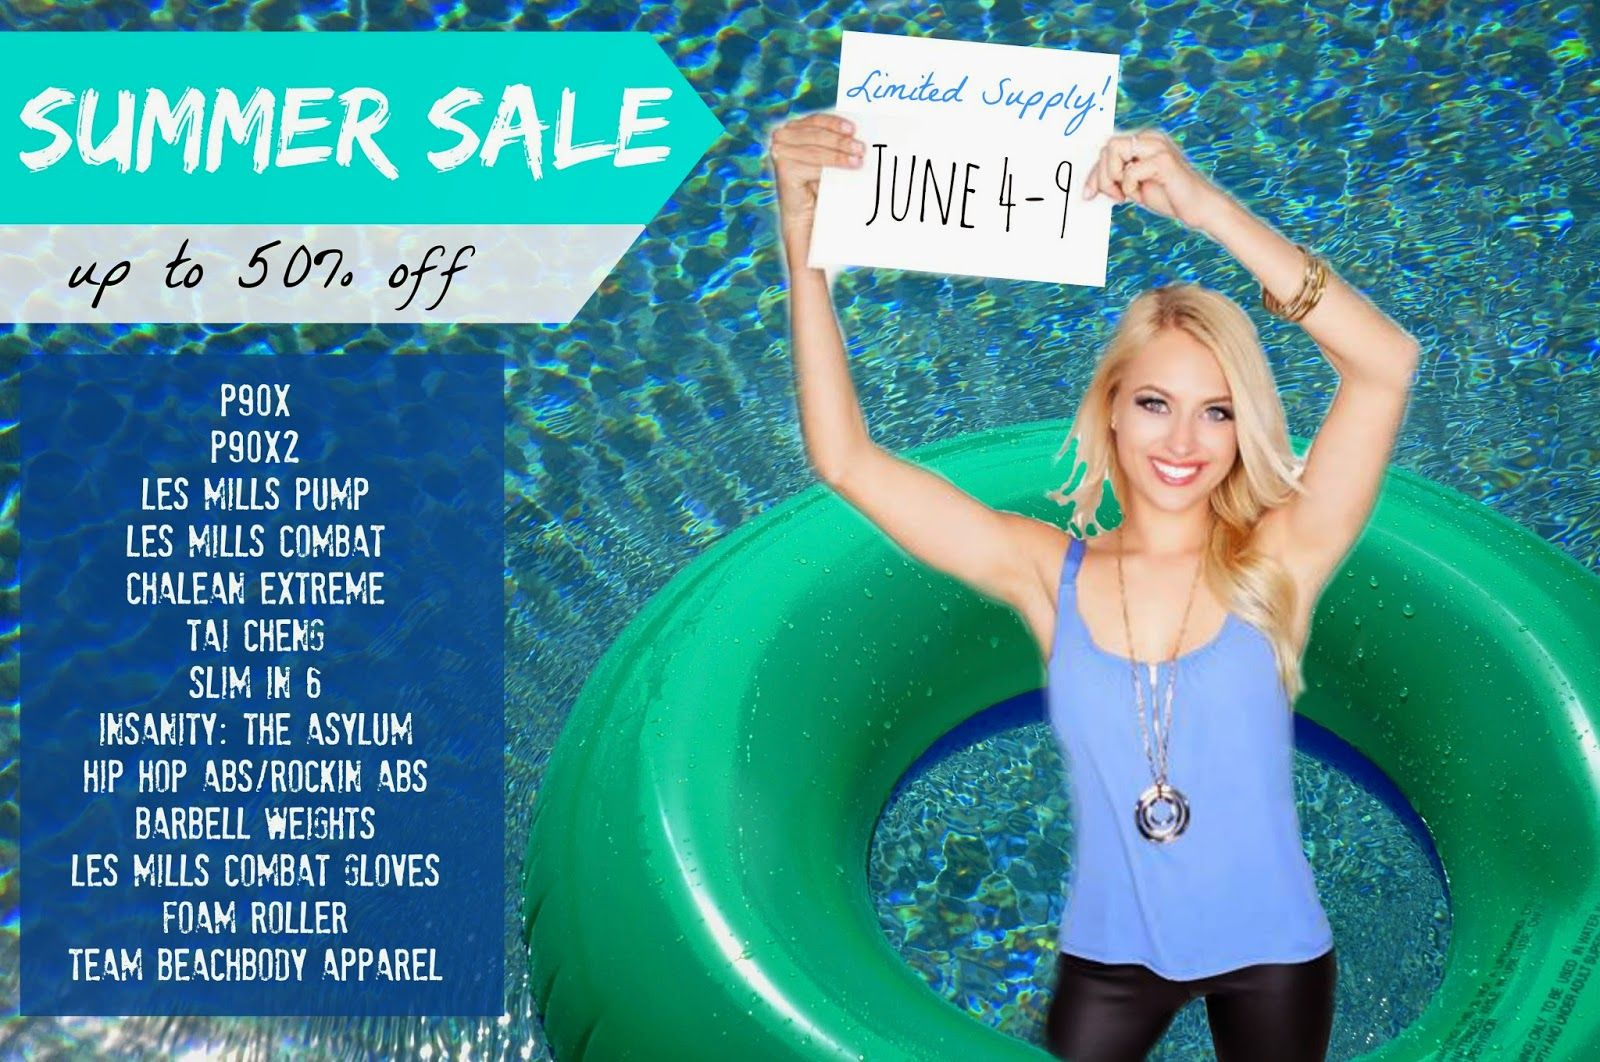 Team Beachbody Summer Sale Promo